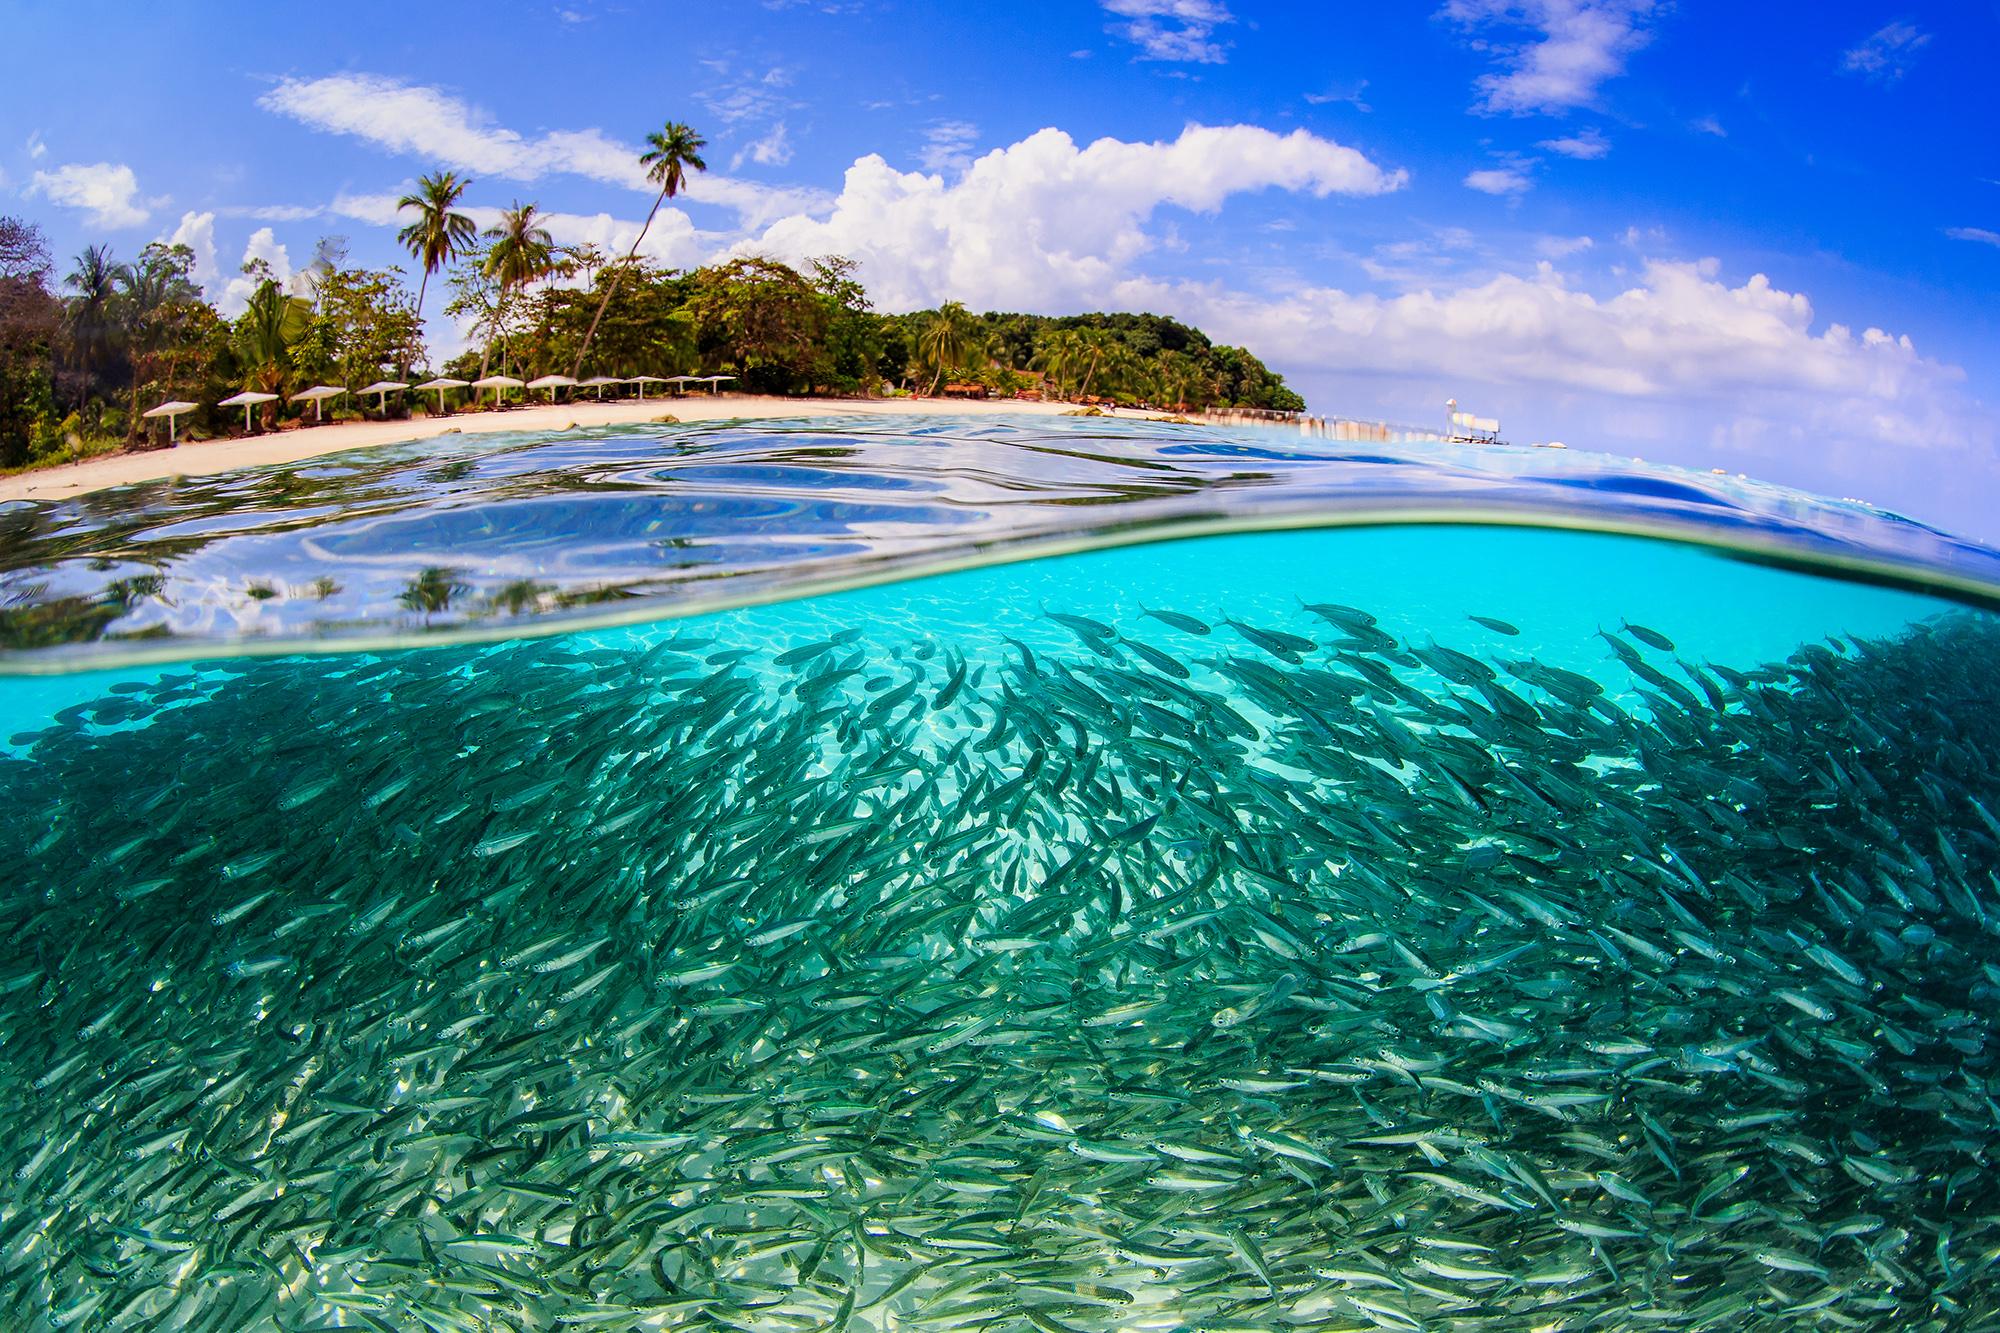 A SCHOOL IN LANG TENGAH ISLAND, MALAYSIA CREDIT: YEN-Yi LEE / coral reef image bank